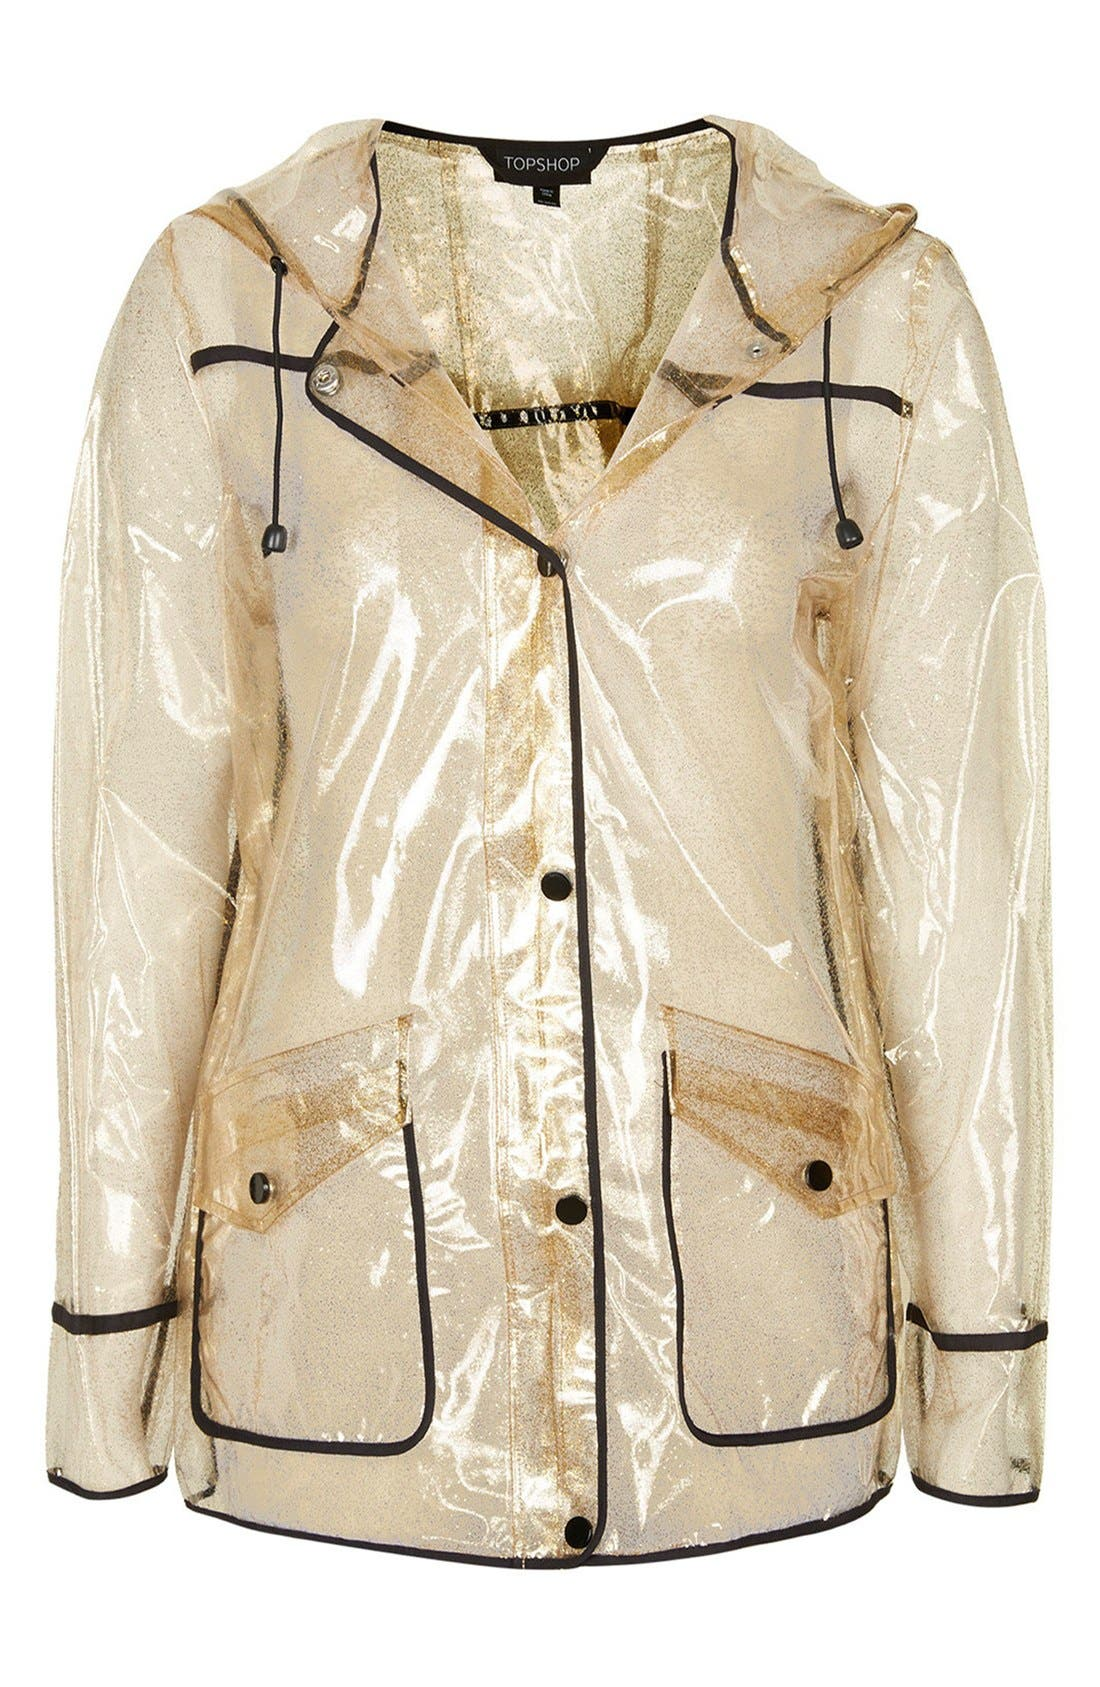 Gold Glitter Transparent Plastic Rain Jacket,                             Alternate thumbnail 2, color,                             710